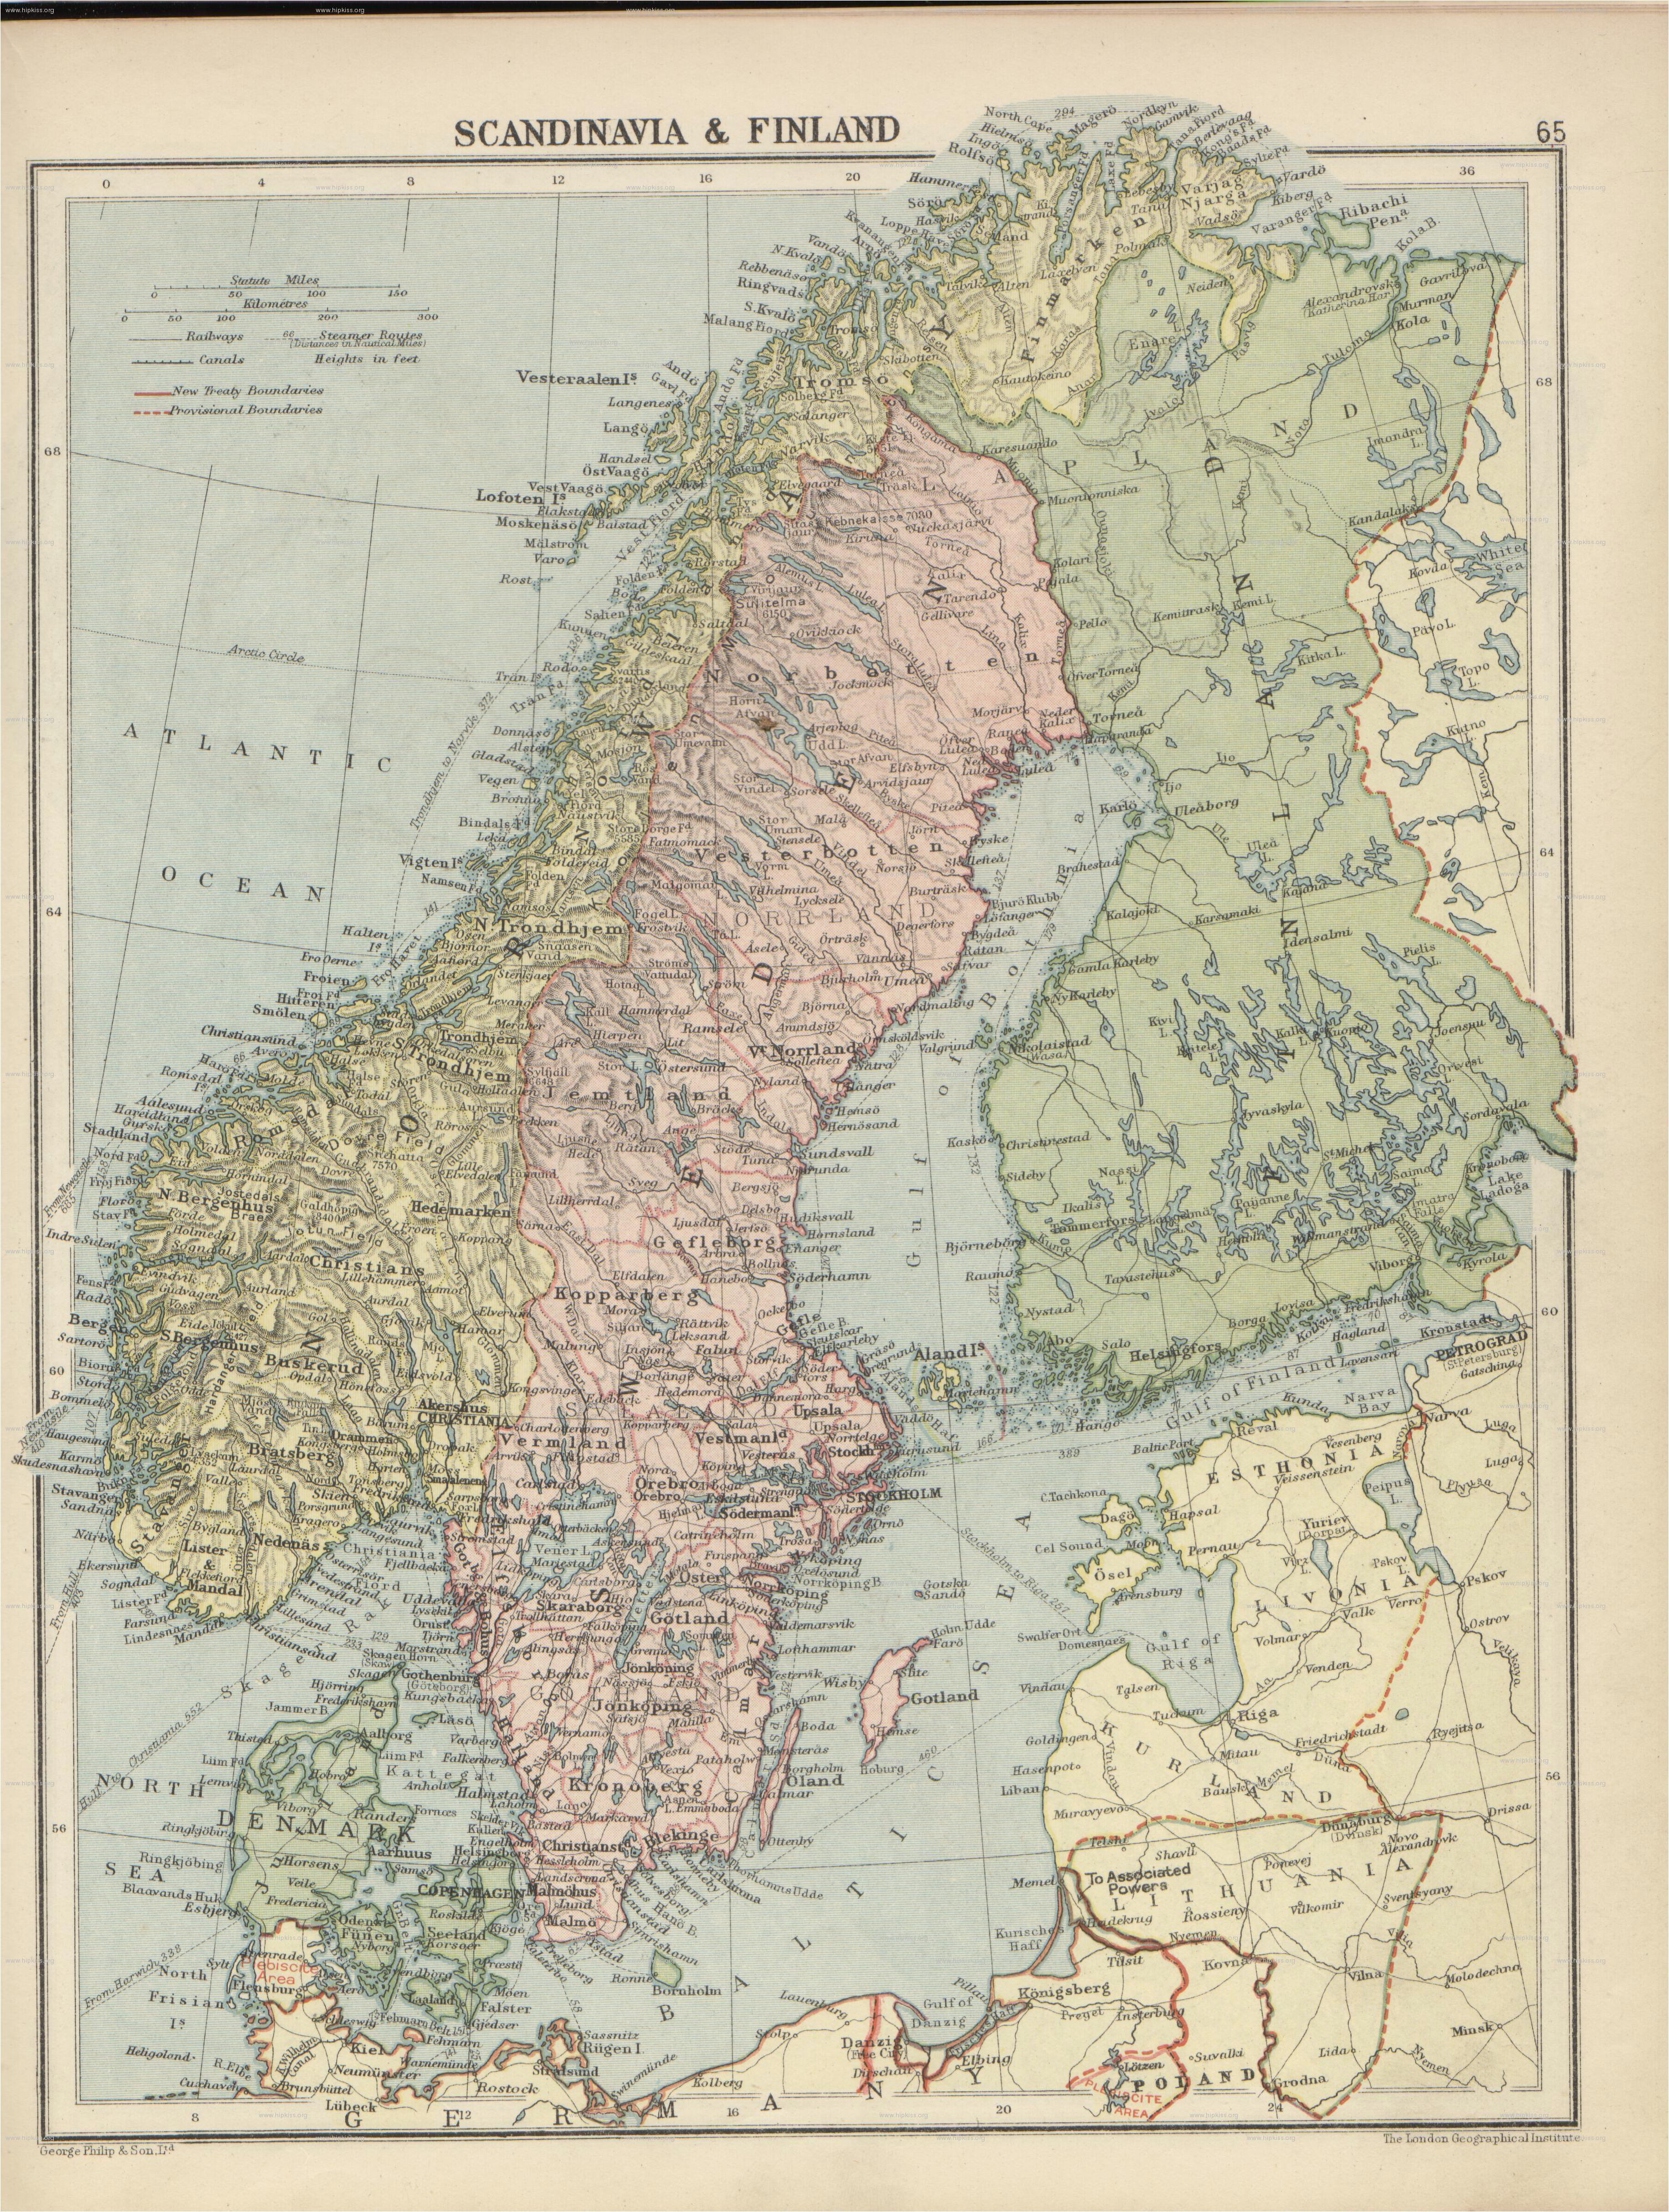 Map Of Europe and Scandinavia Historical Maps Of Scandinavia